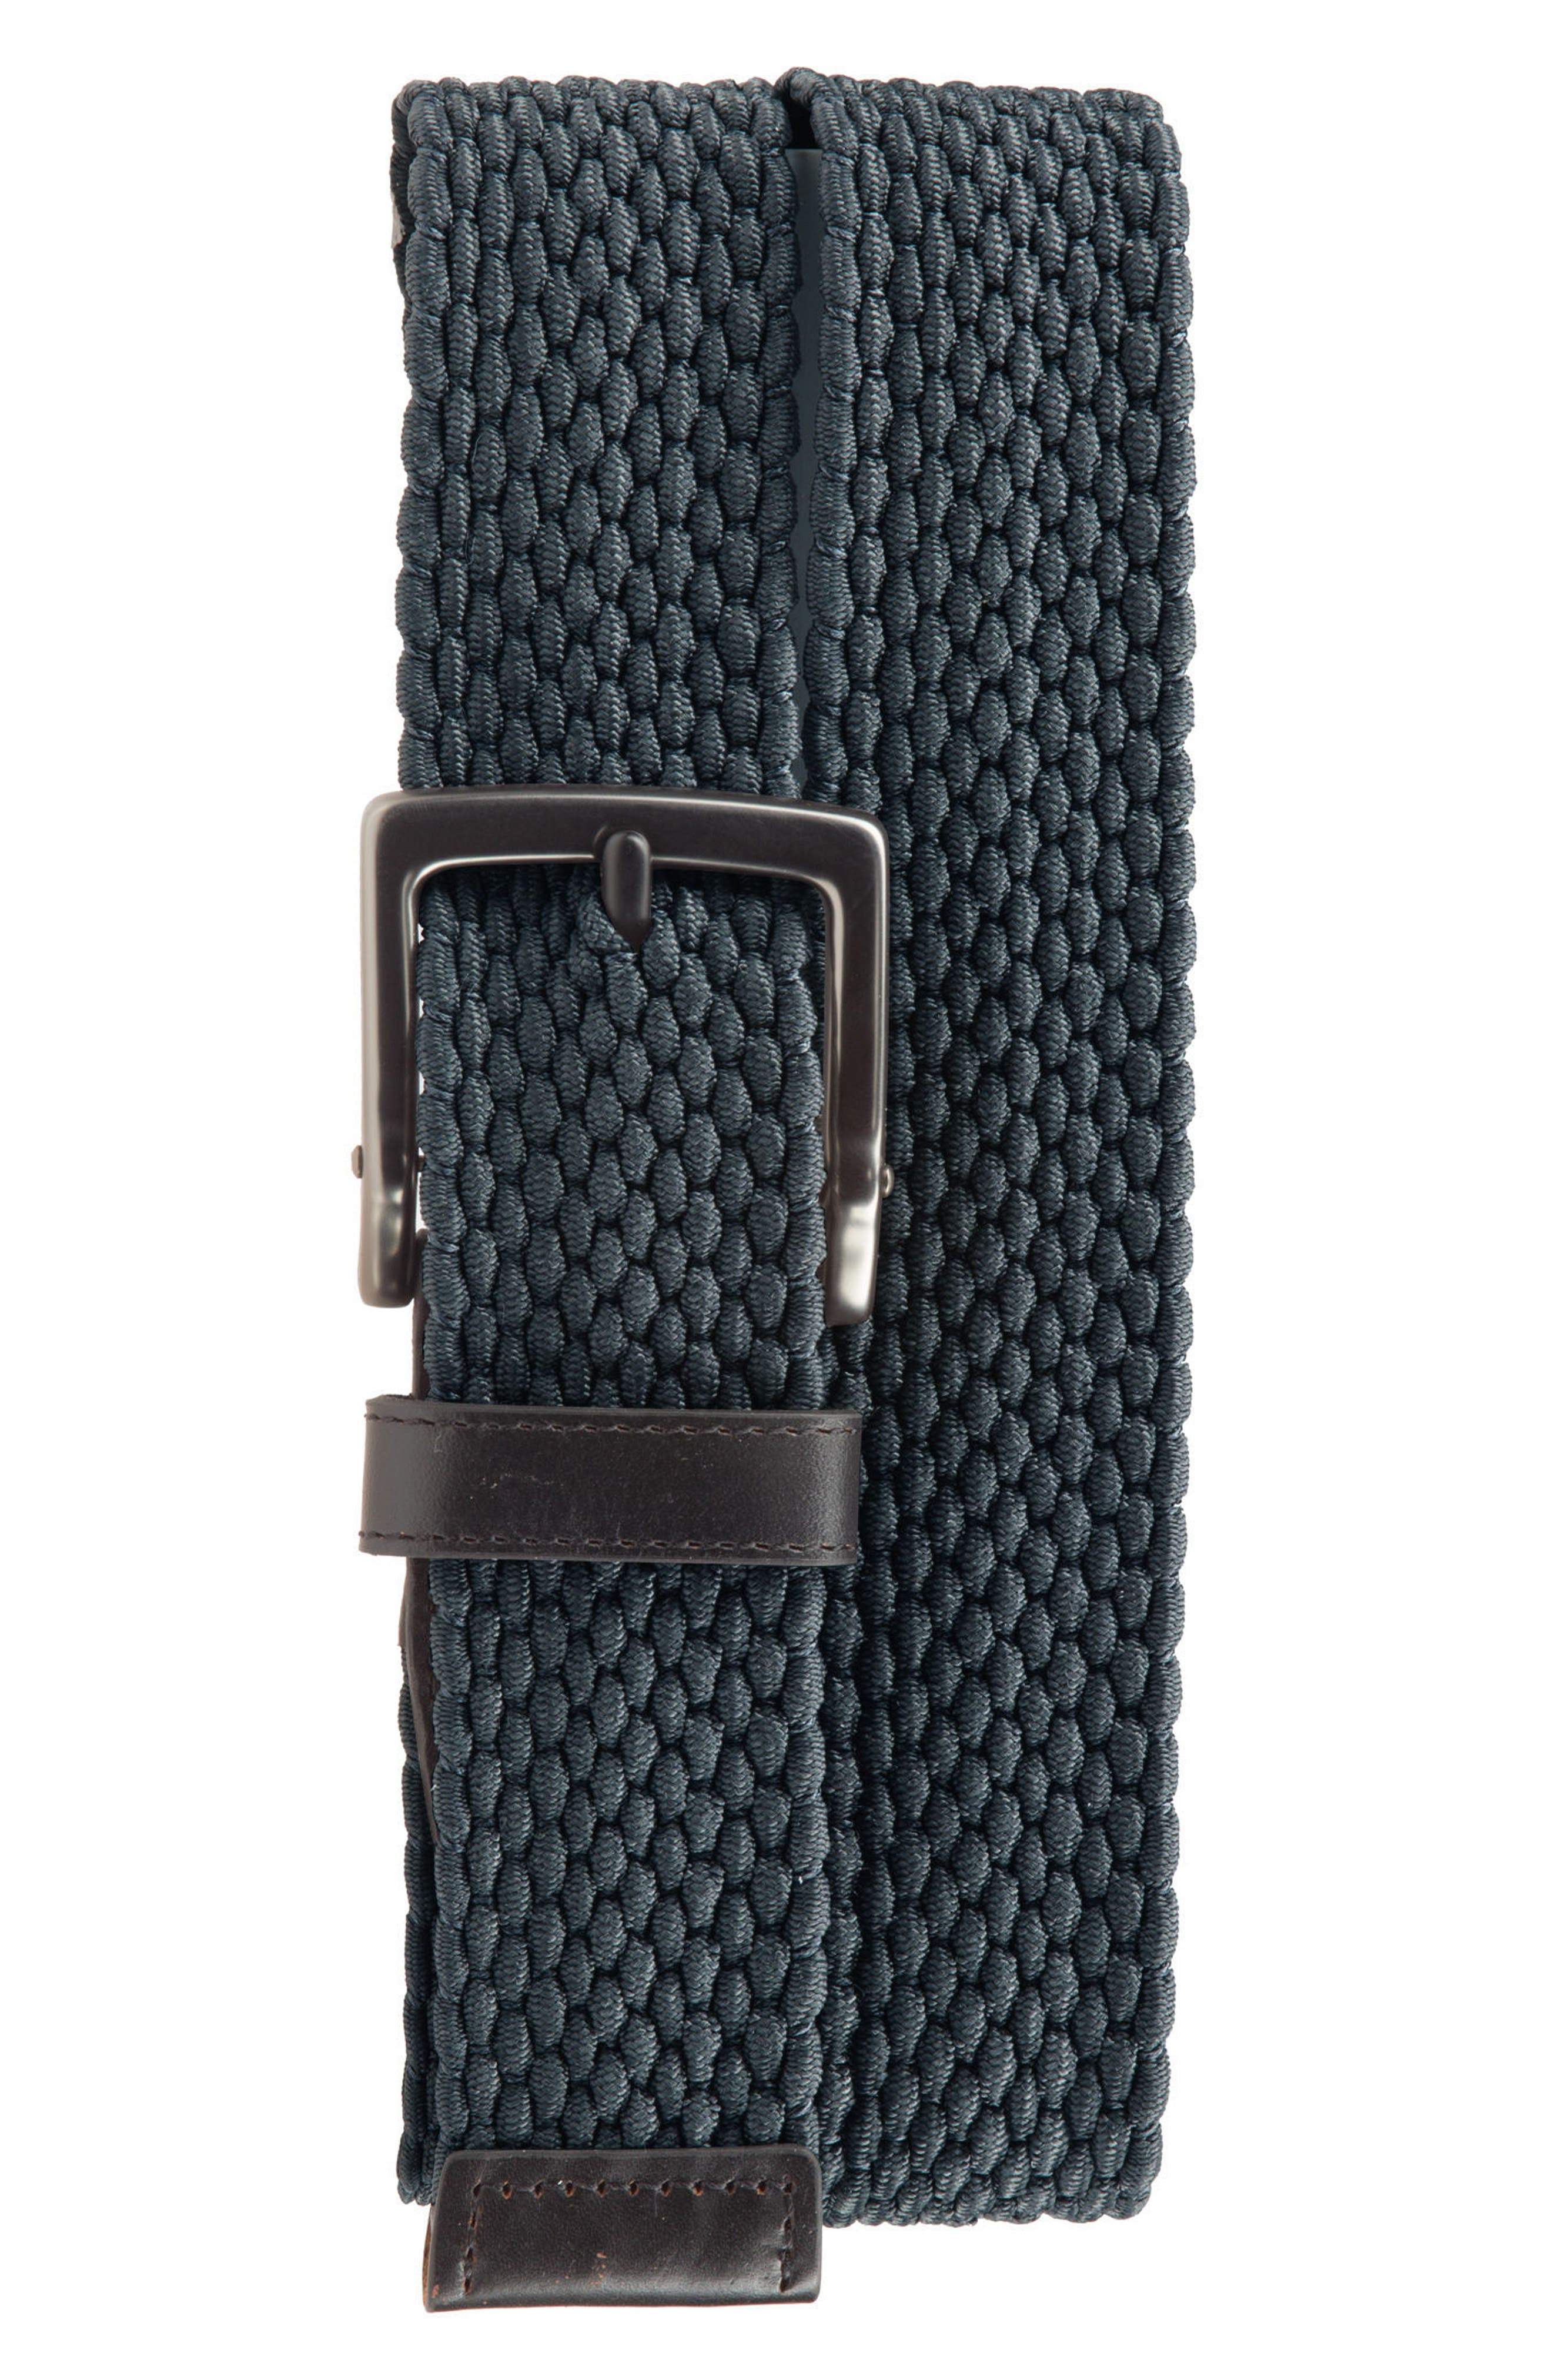 Nike Men'S Stretch Woven Leather-Trim Belt, Navy, Armory Navy